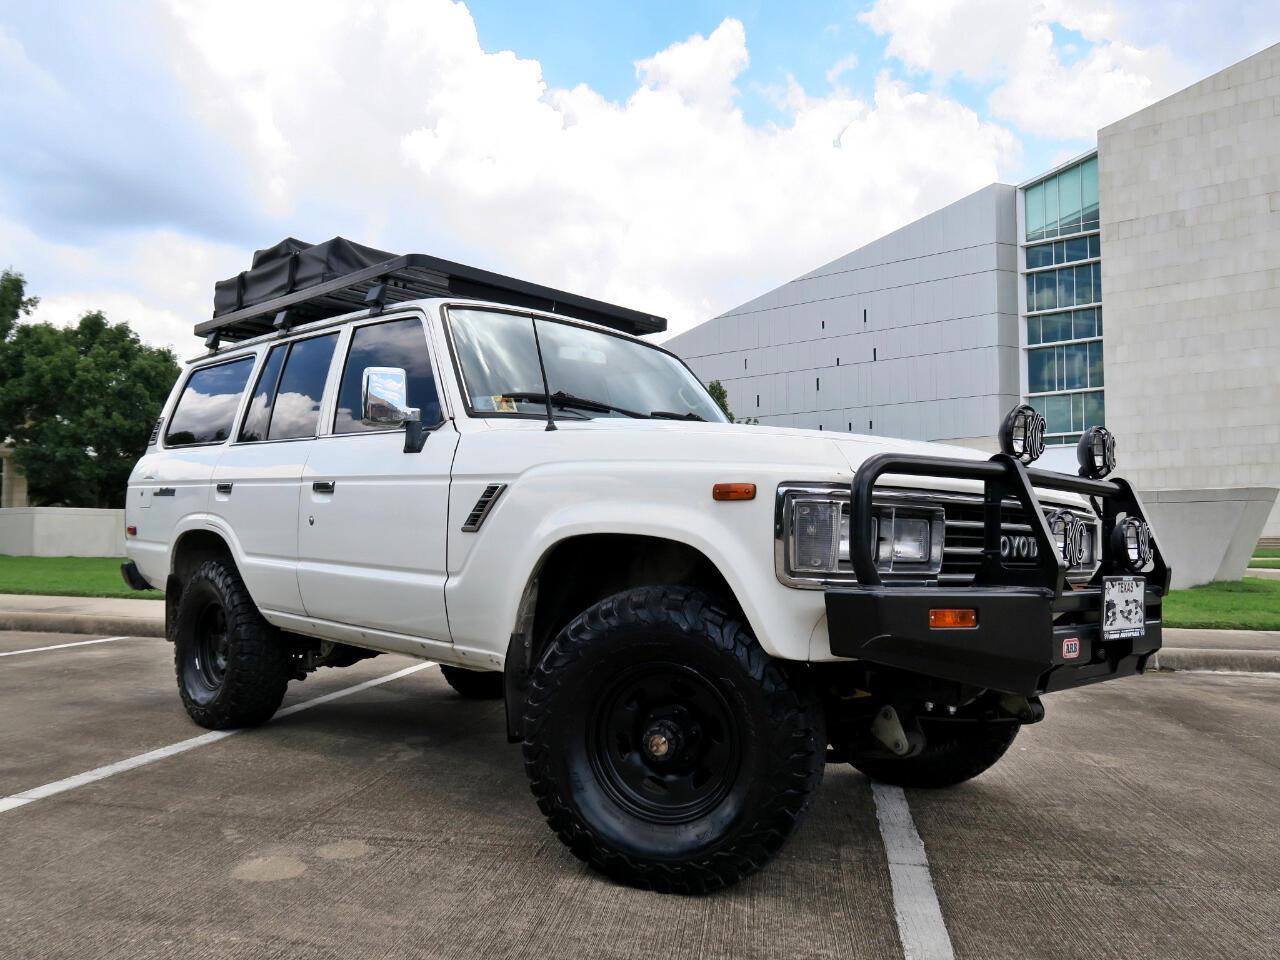 1989 Toyota Land Cruiser 4dr Wagon